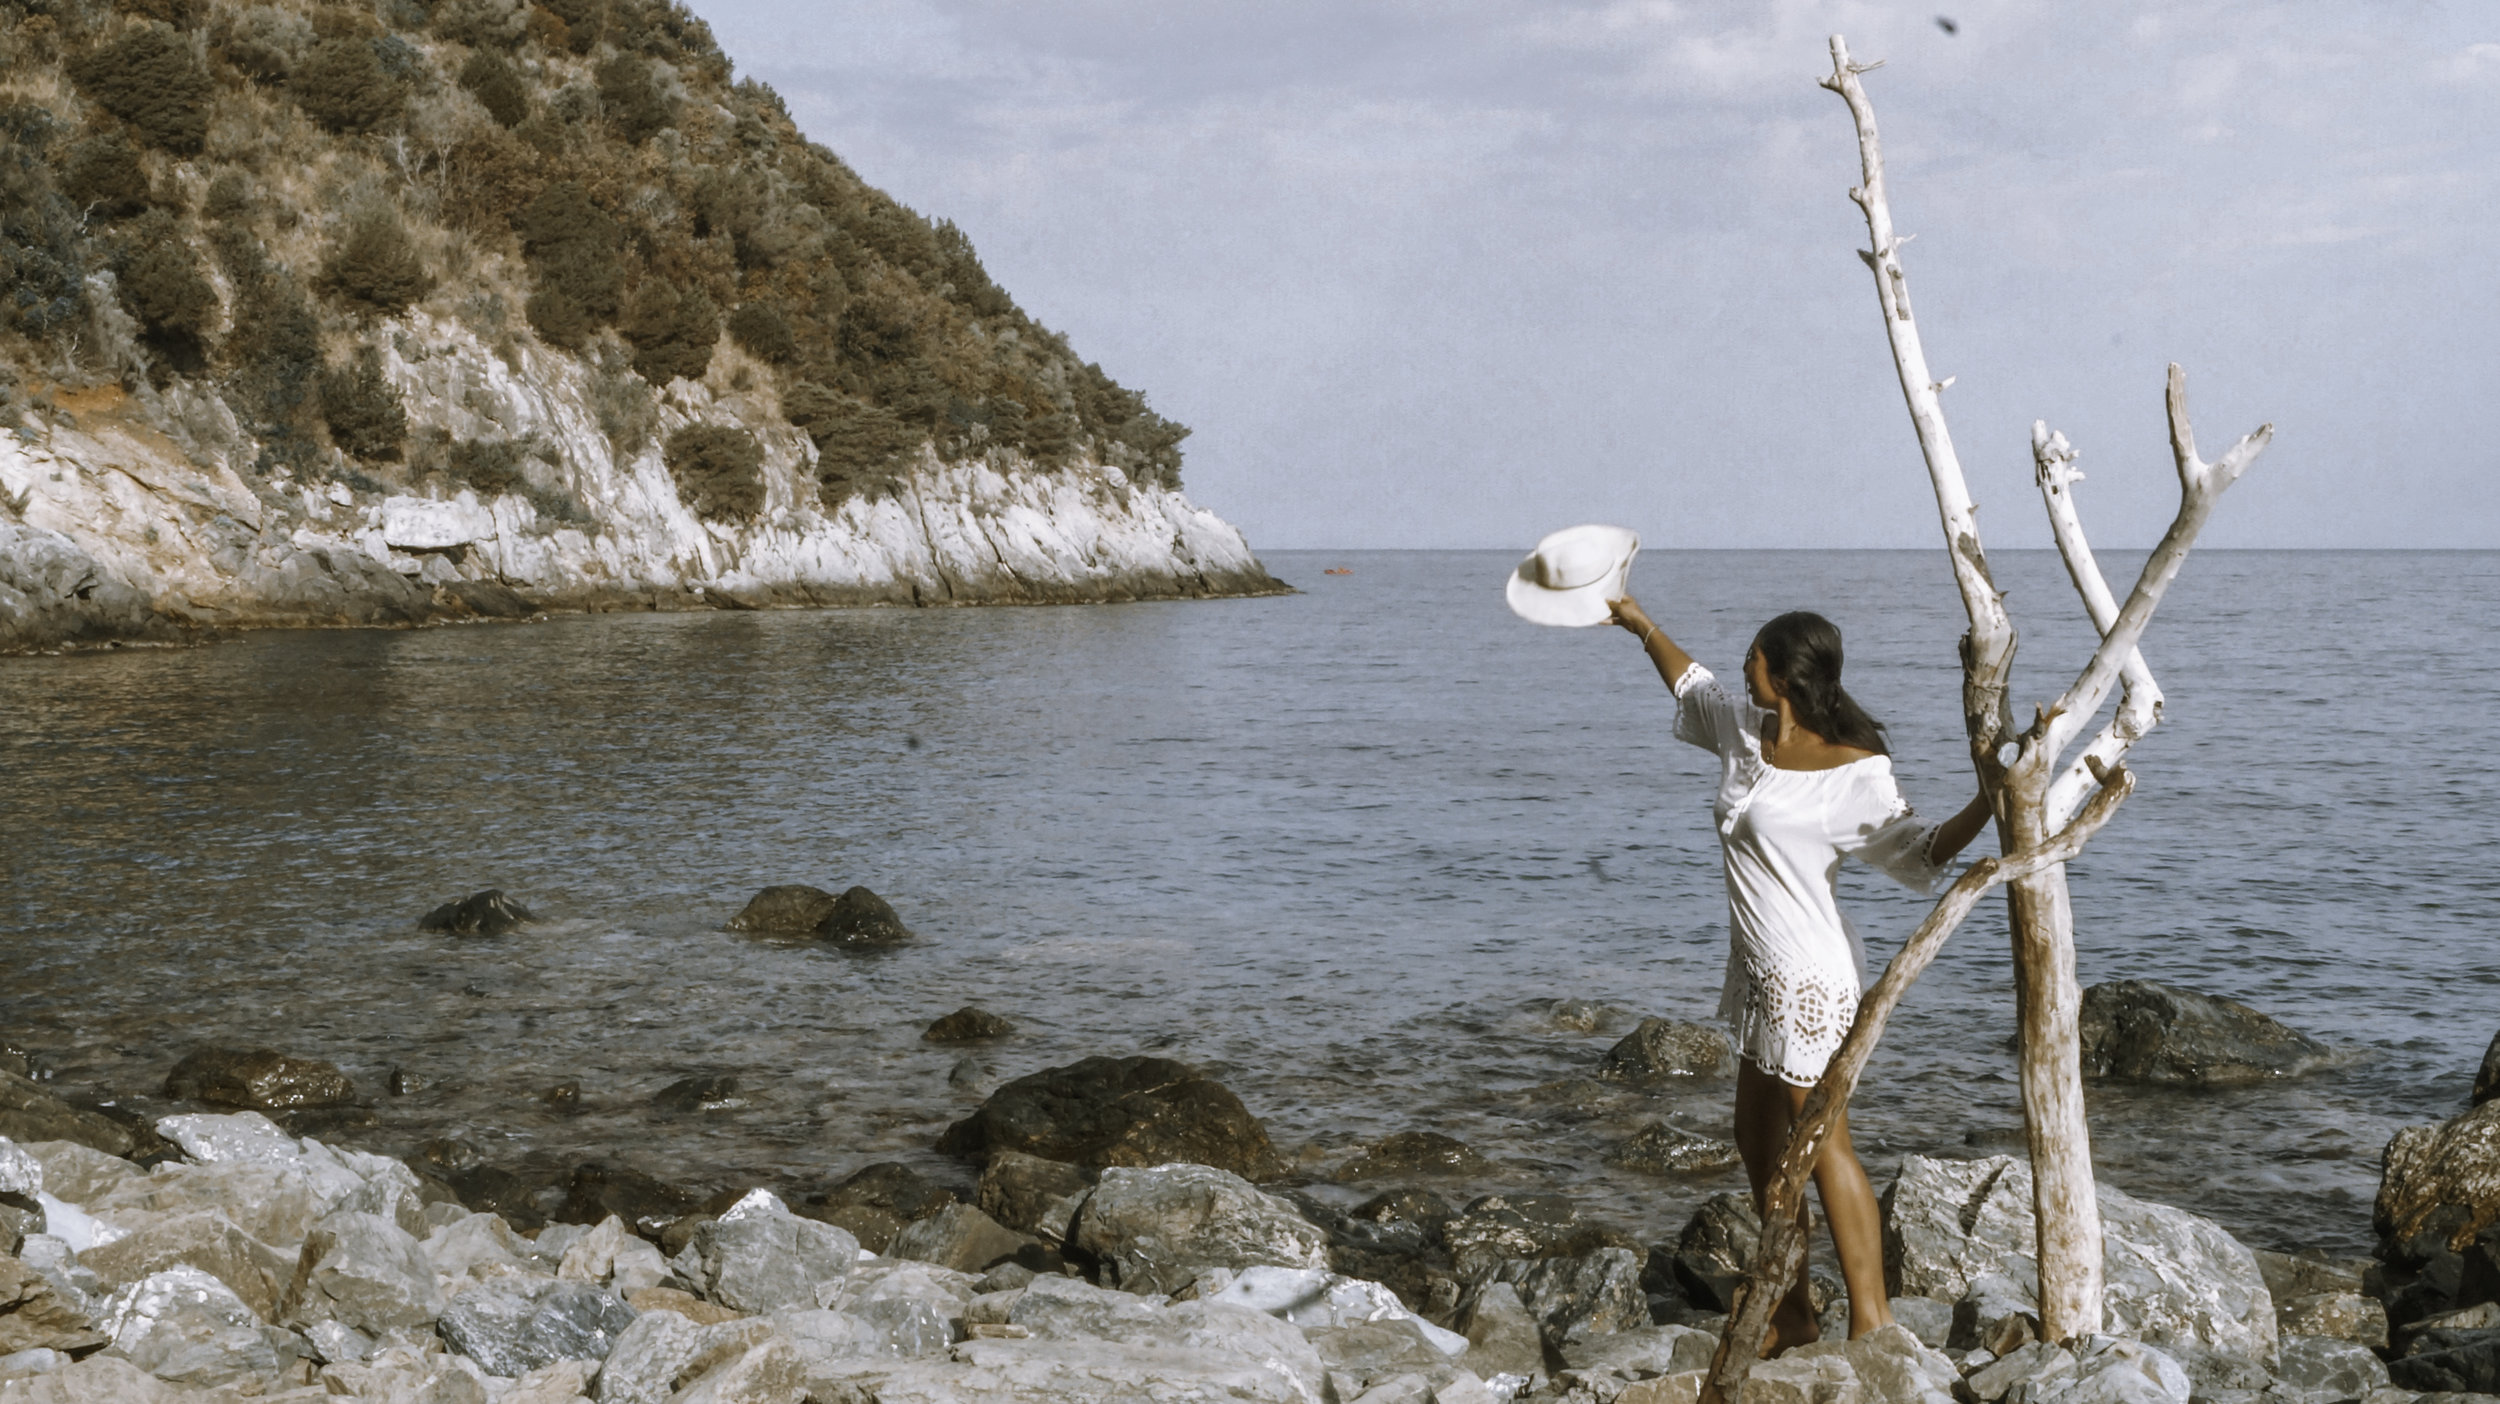 Monte Argentario, Tuscany Coast - Beach Vibes 3 - CocoBay x illumelation.jpg